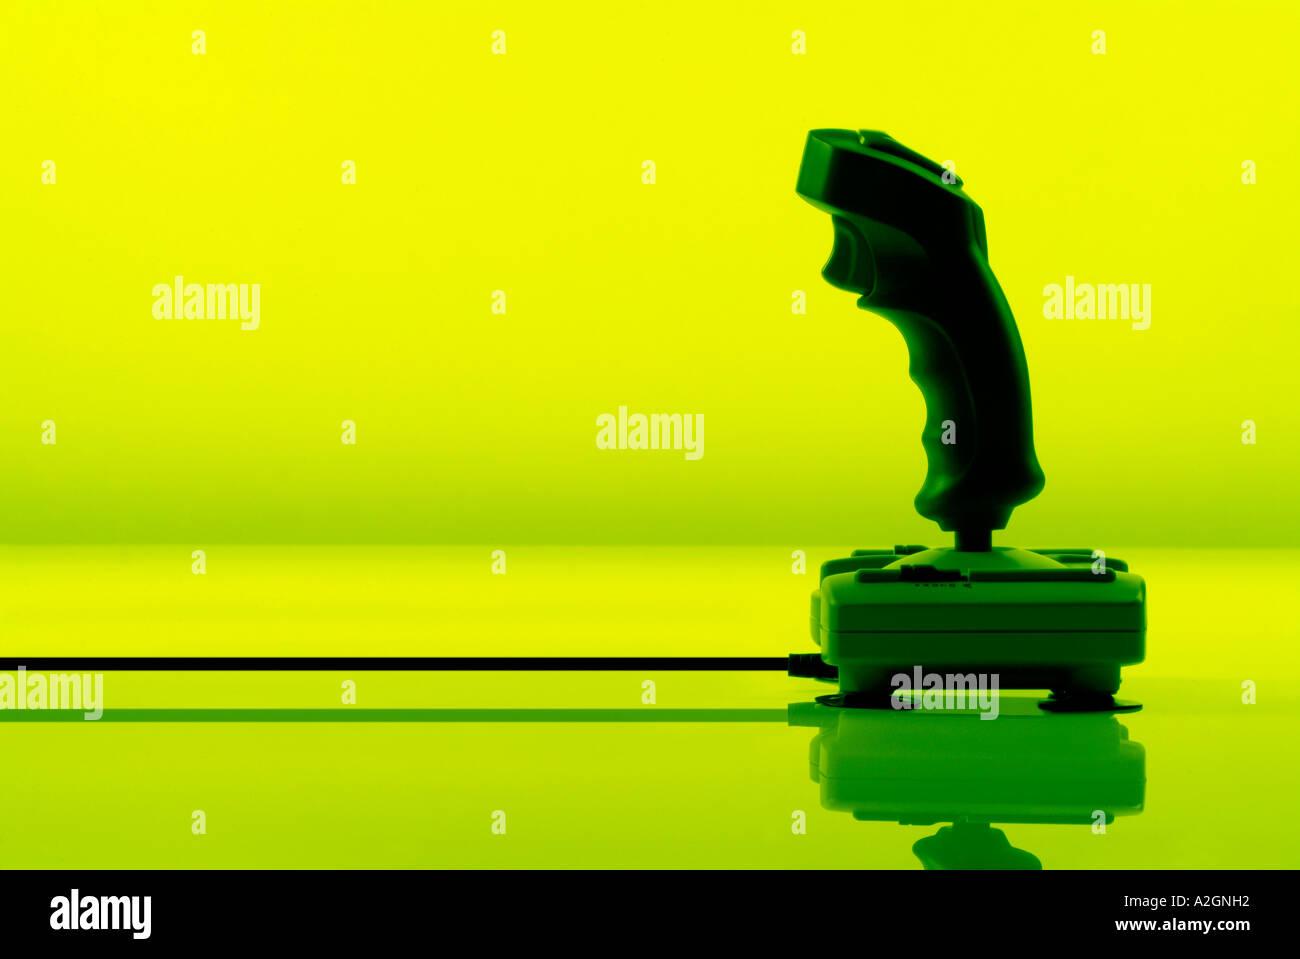 Joystick - Stock Image